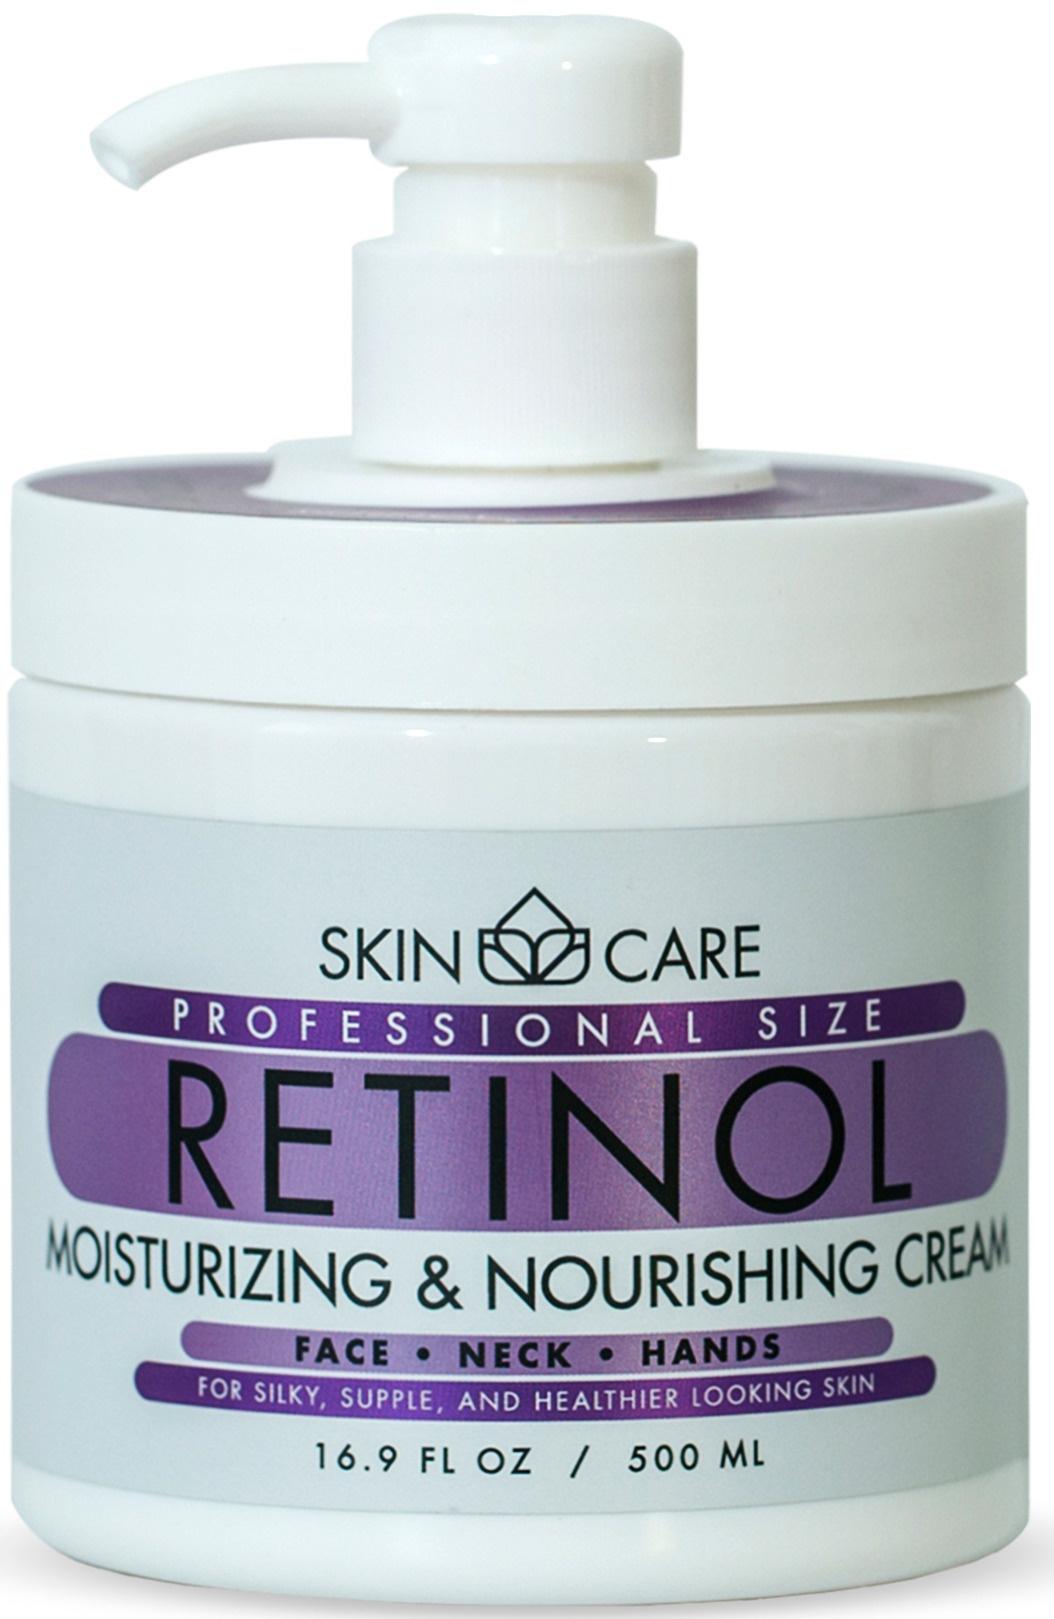 Skin Care Professional Size Retinol Moisturising & Nourishing Cream